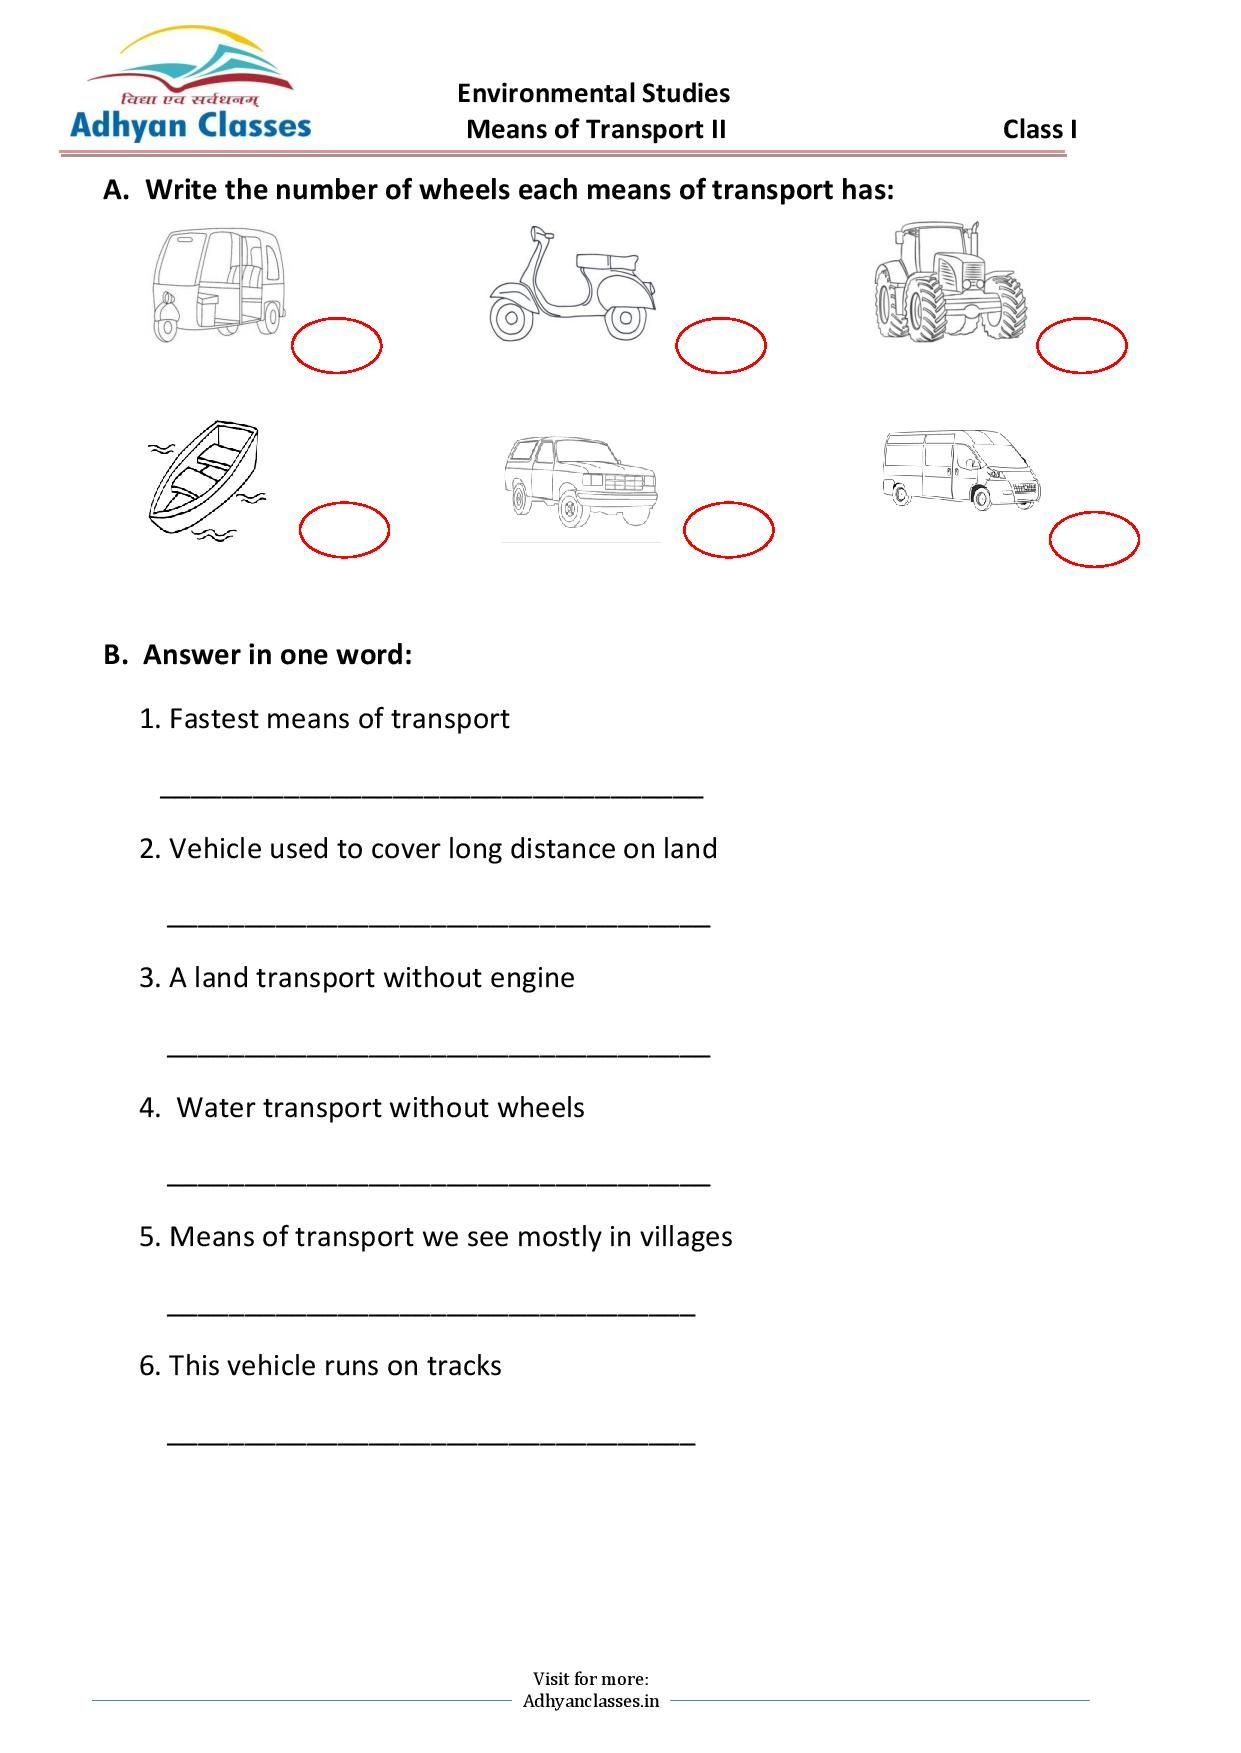 medium resolution of Means of Transport Worksheet for Grade II   First grade math worksheets